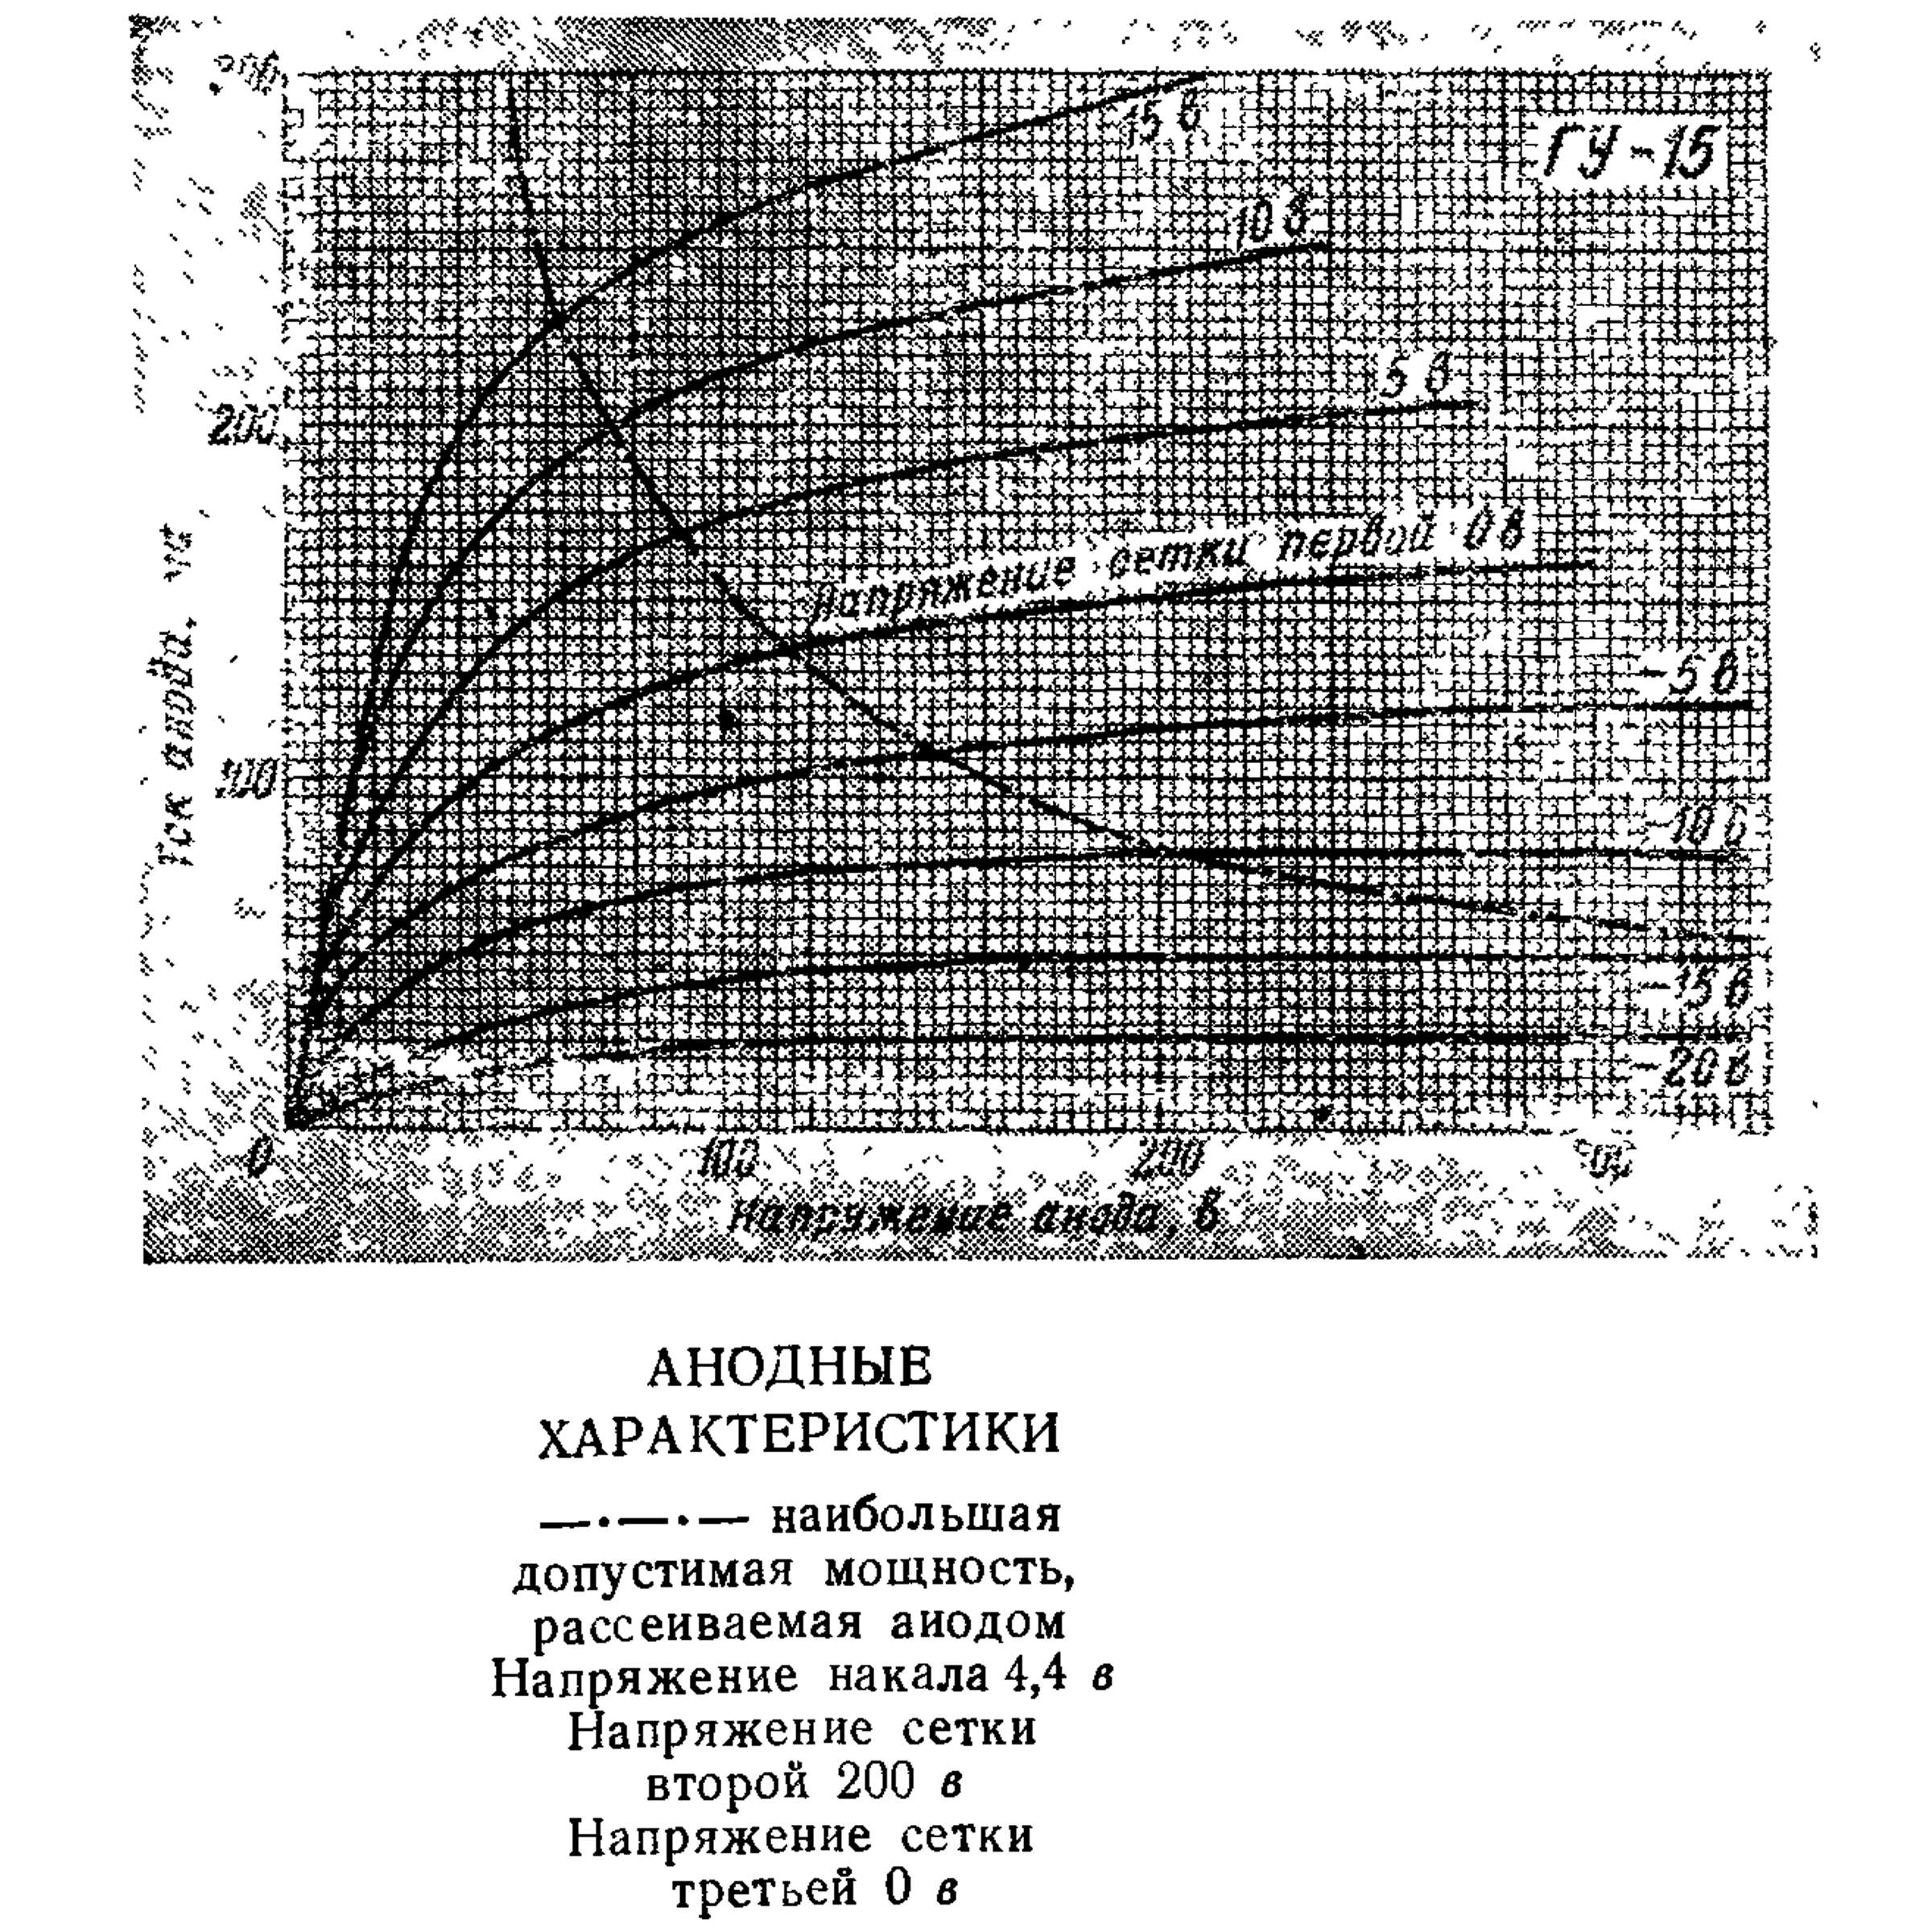 Параметры радиолампы ГУ-15